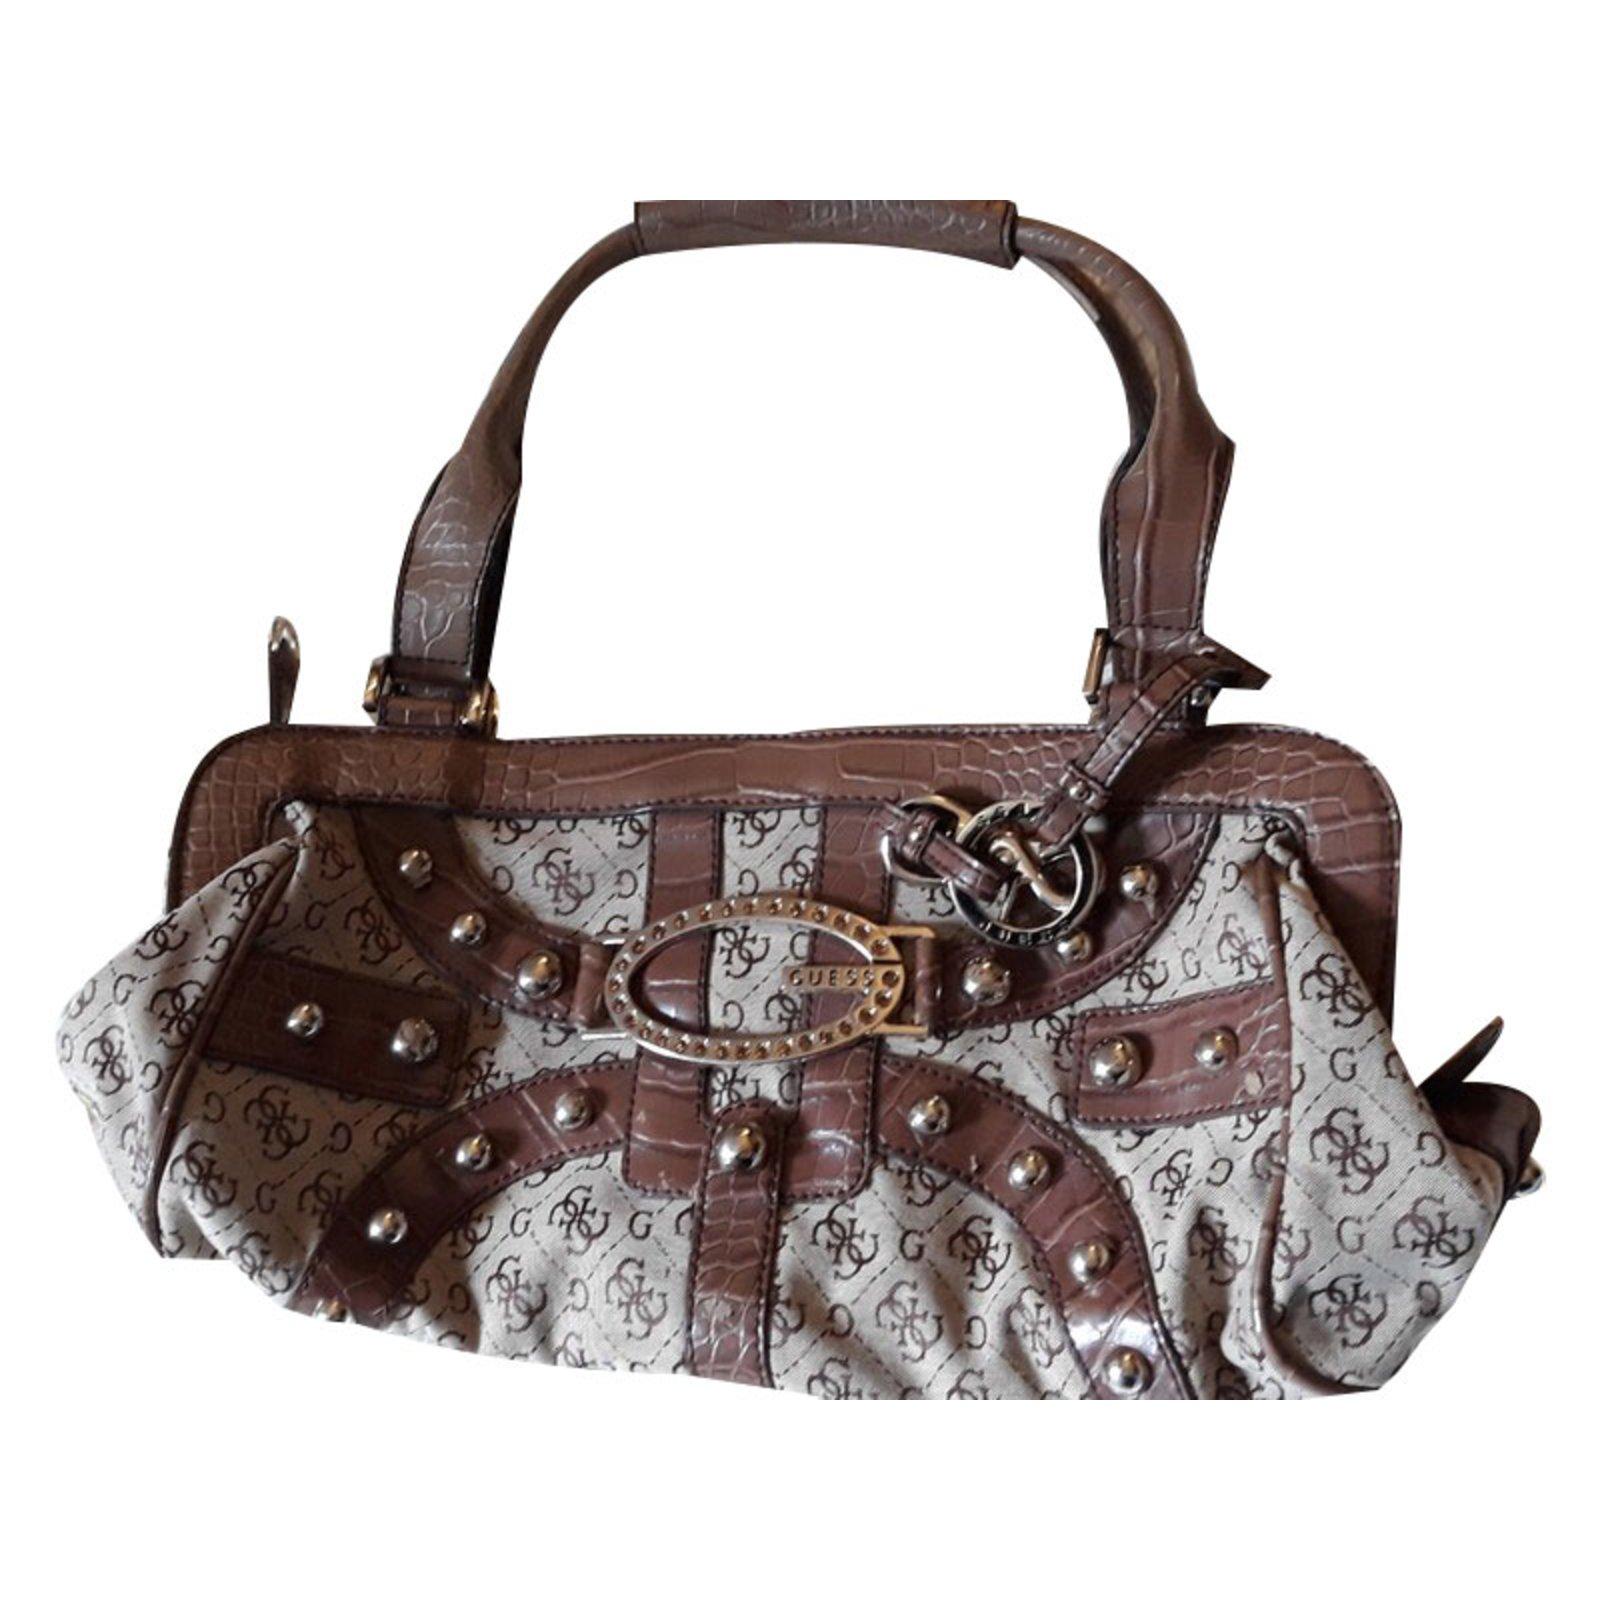 Guess Handbags Cloth Brown Ref